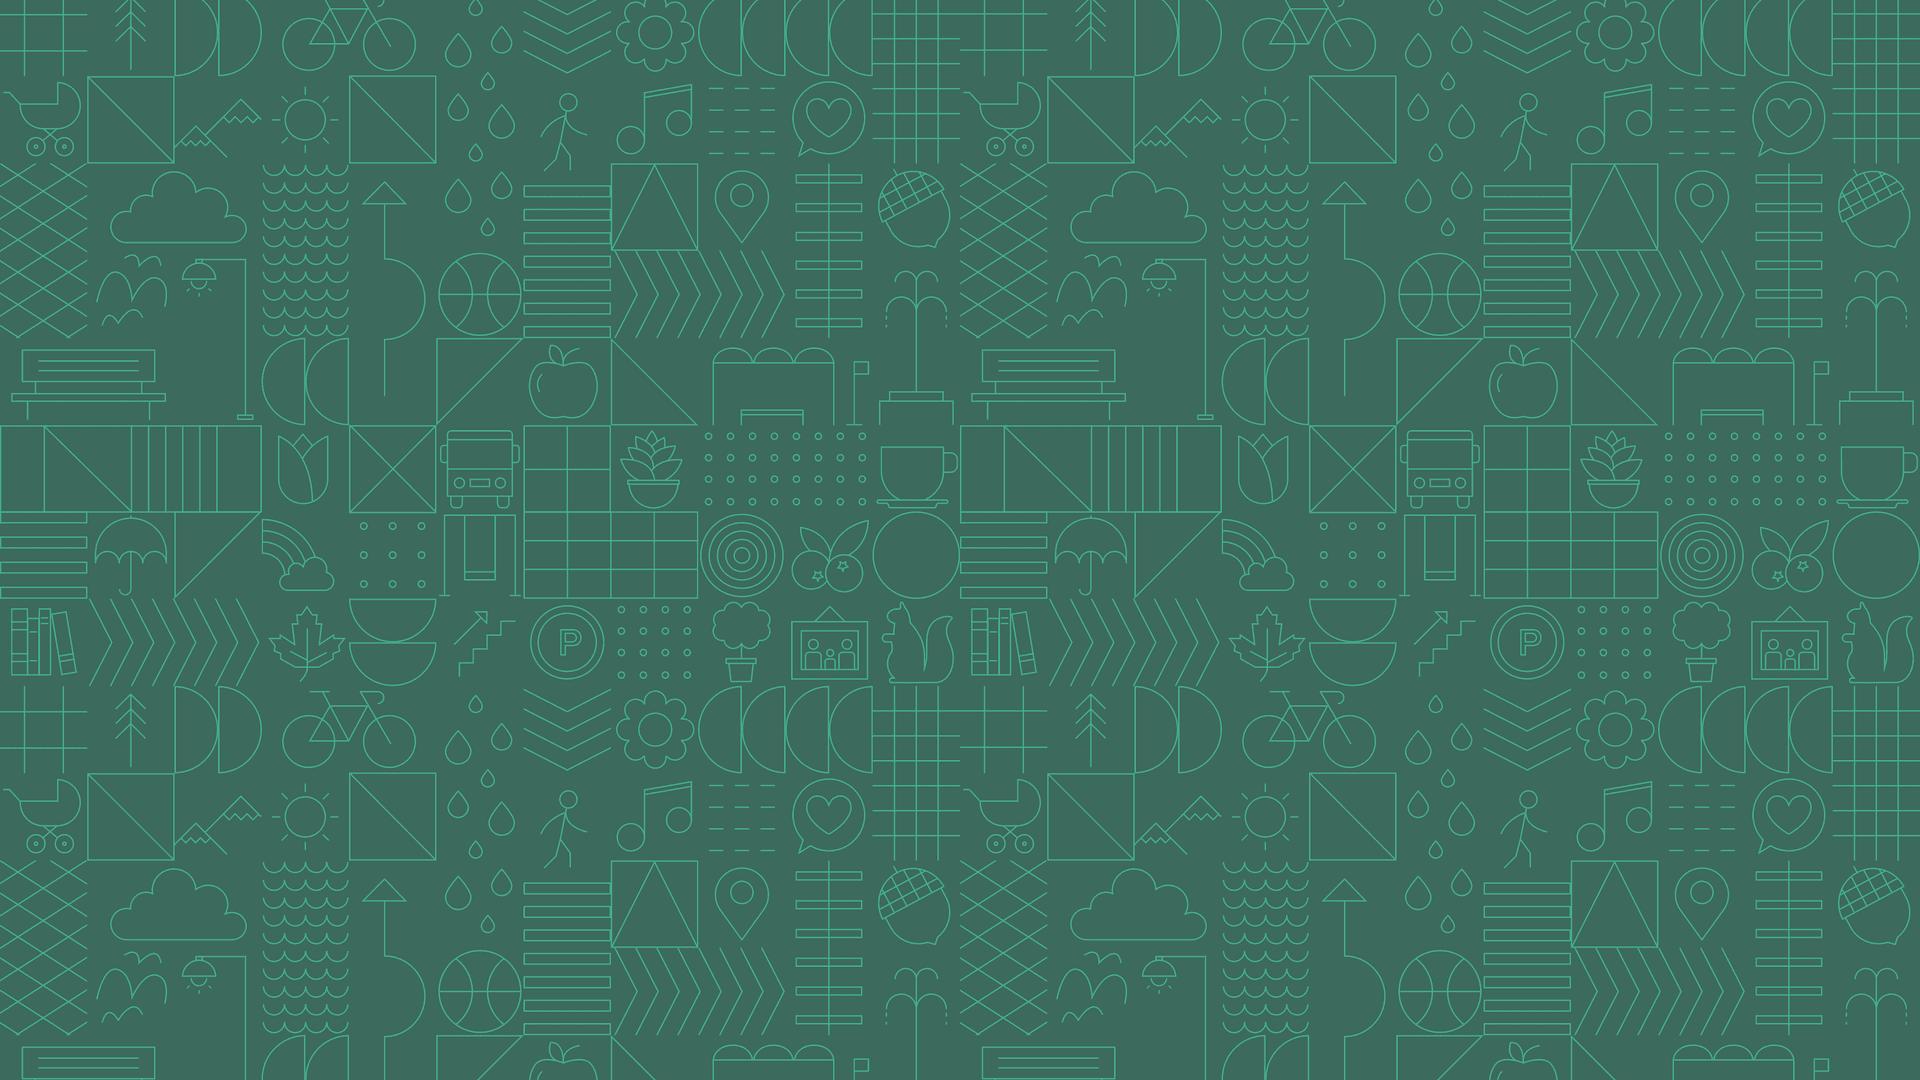 UNA System image green